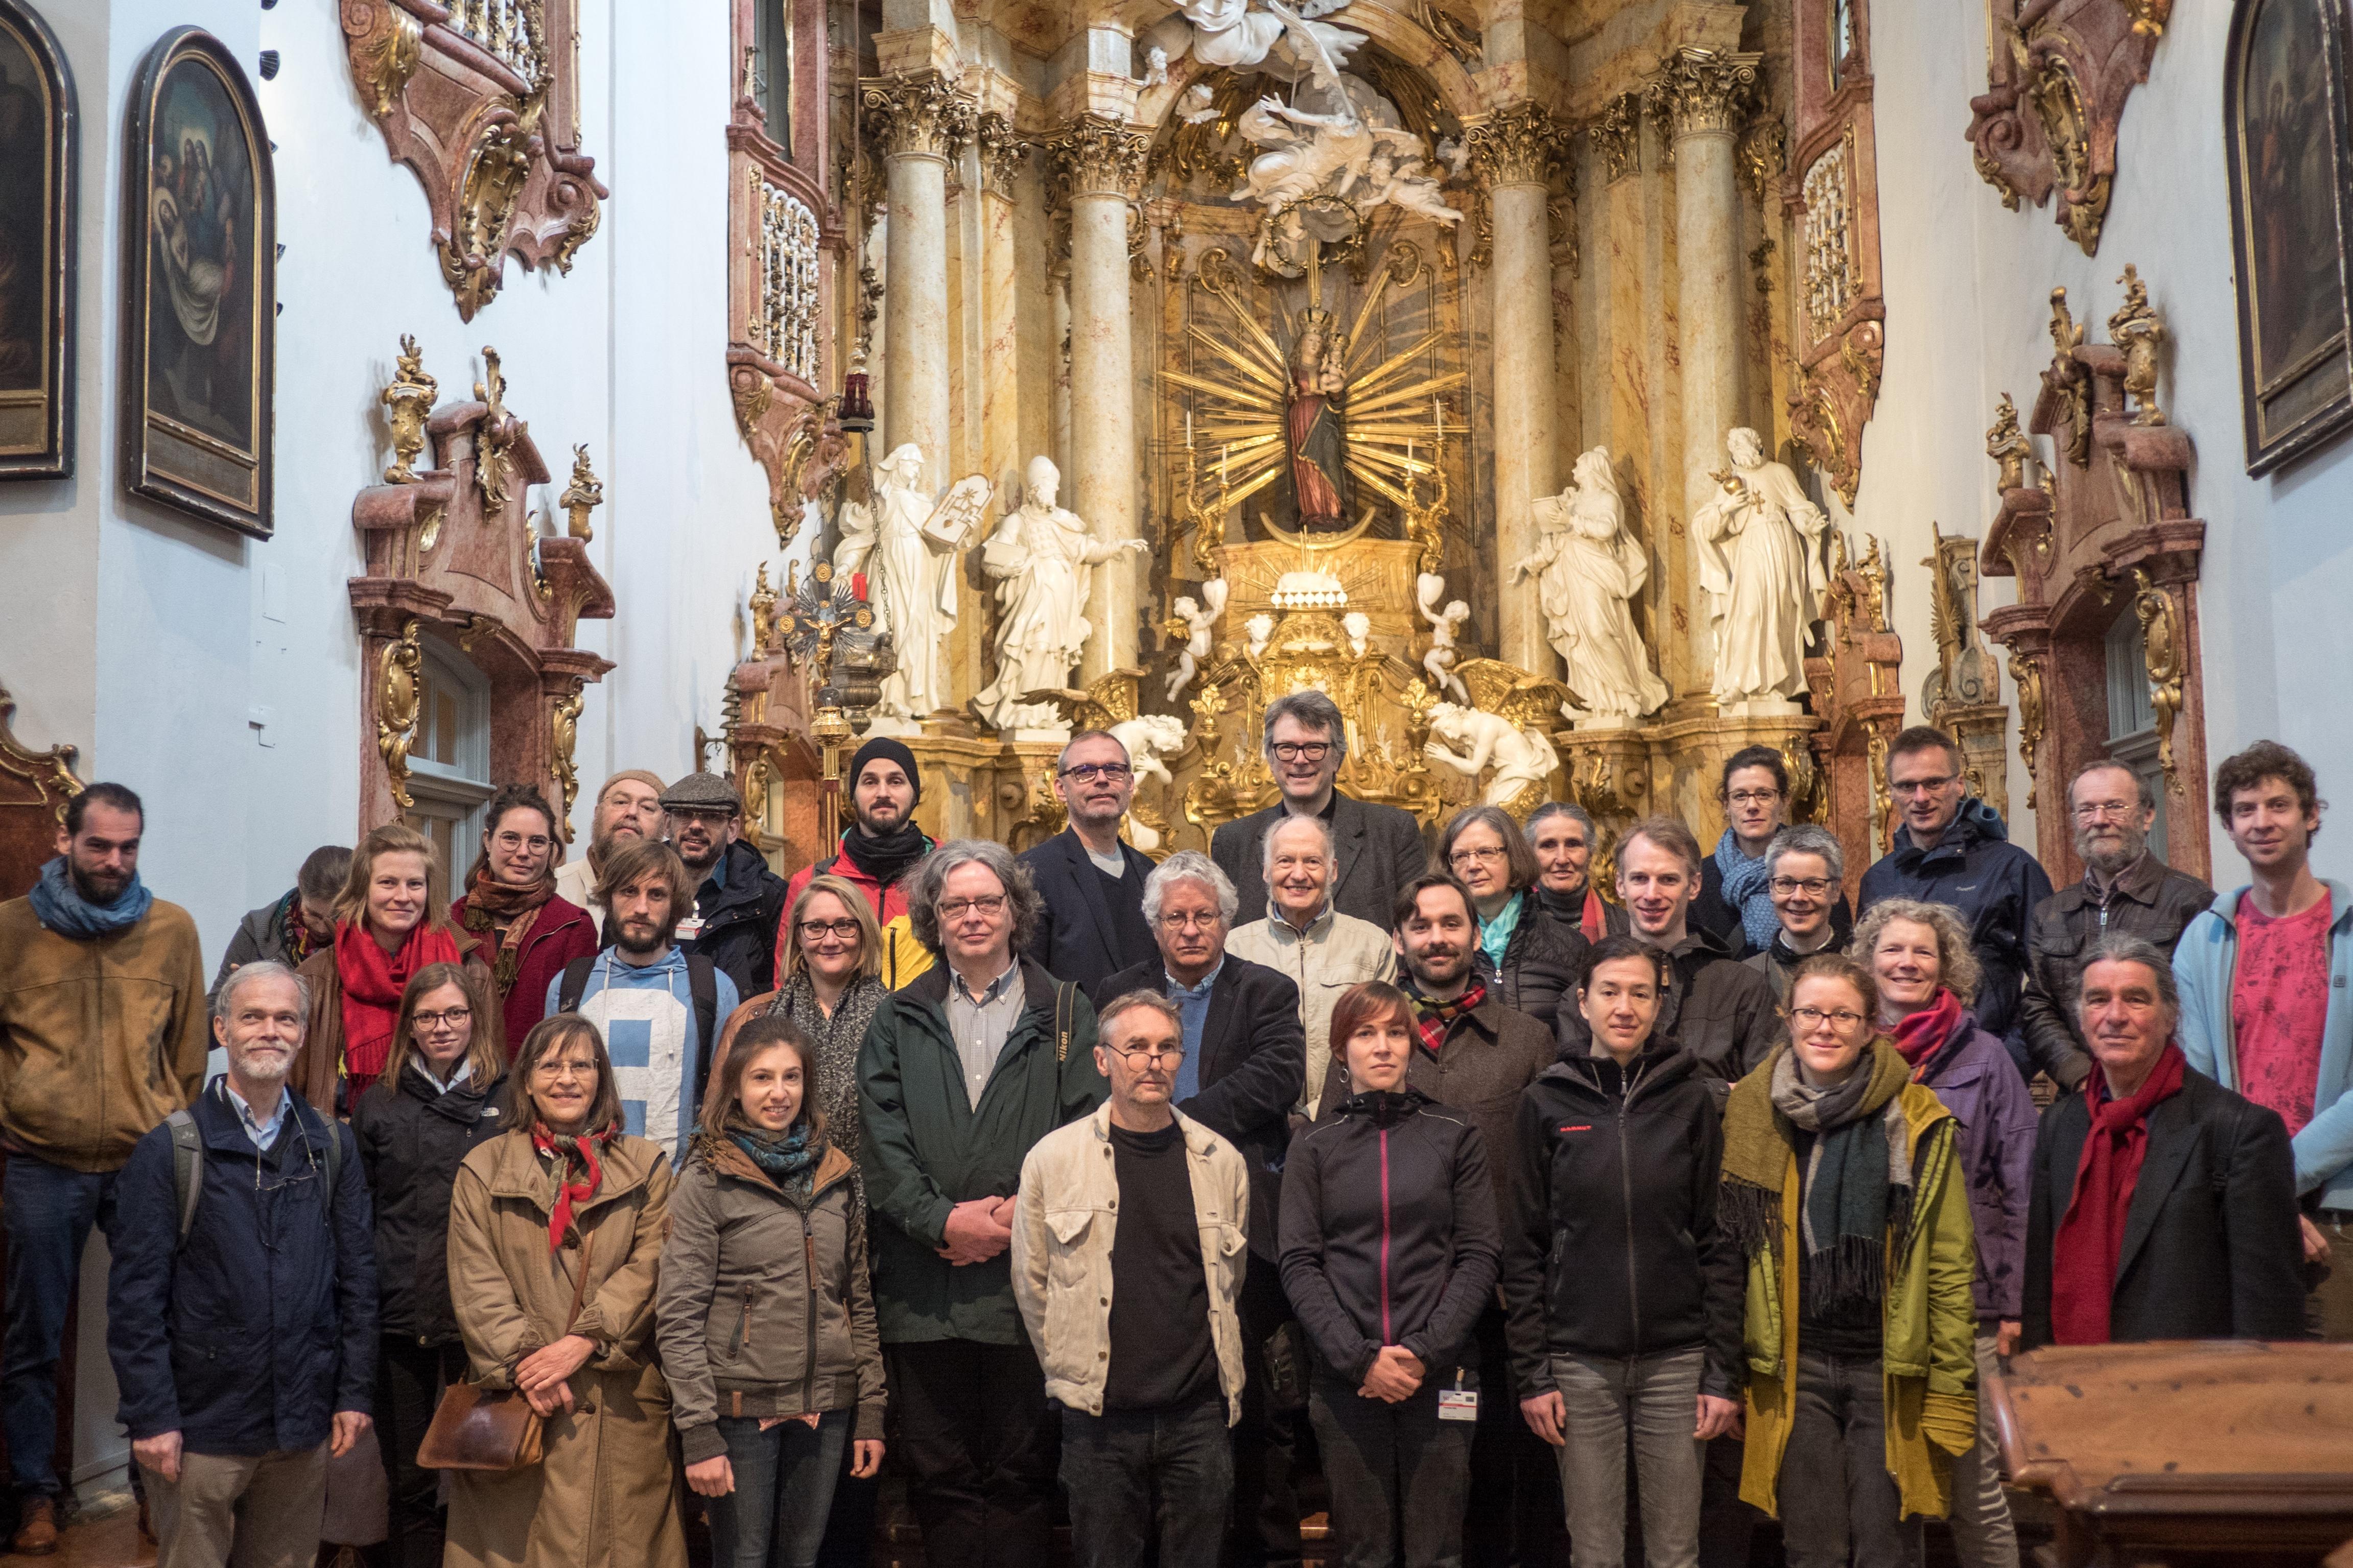 Gruppenfoto vom Fachgruppentreffen (Foto: Johan Ter Maat)